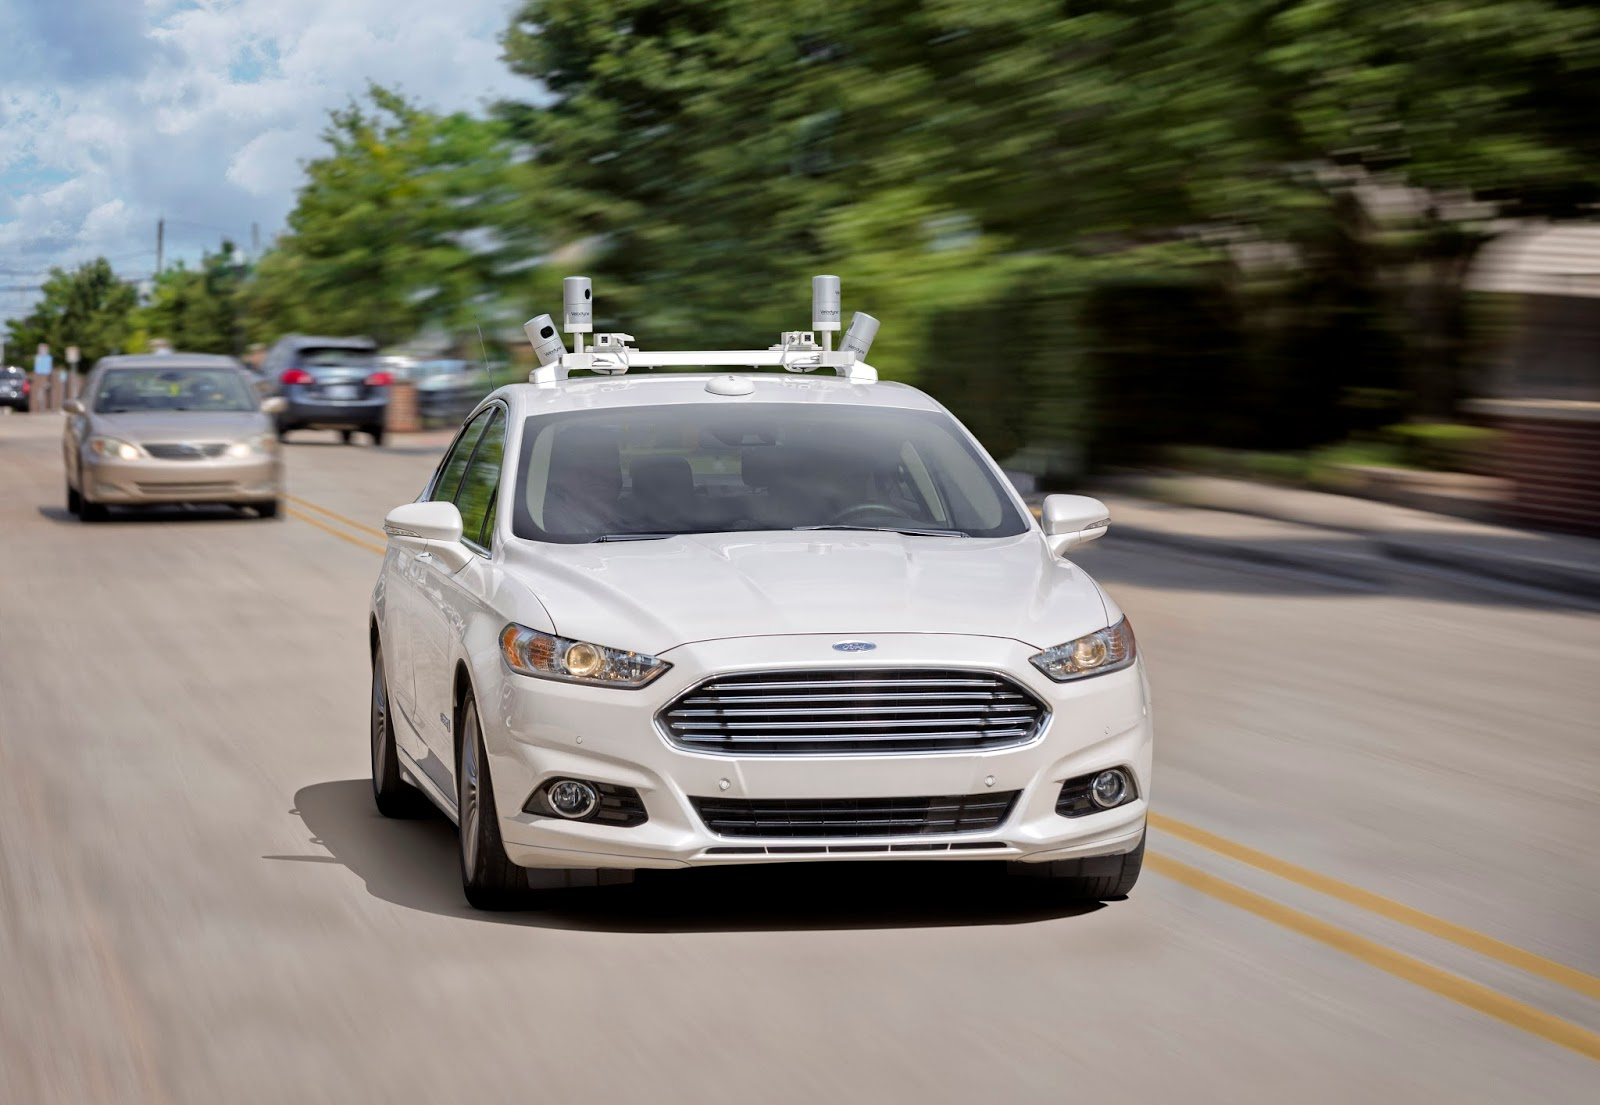 Ford Fusion AV 02 HR 1 Η Ford στοχεύει να βγάλει σε μαζική παραγωγή ένα πλήρως αυτόνομο όχημα το 2021 Autonomous Driving, Ford, videos, Τεχνολογία